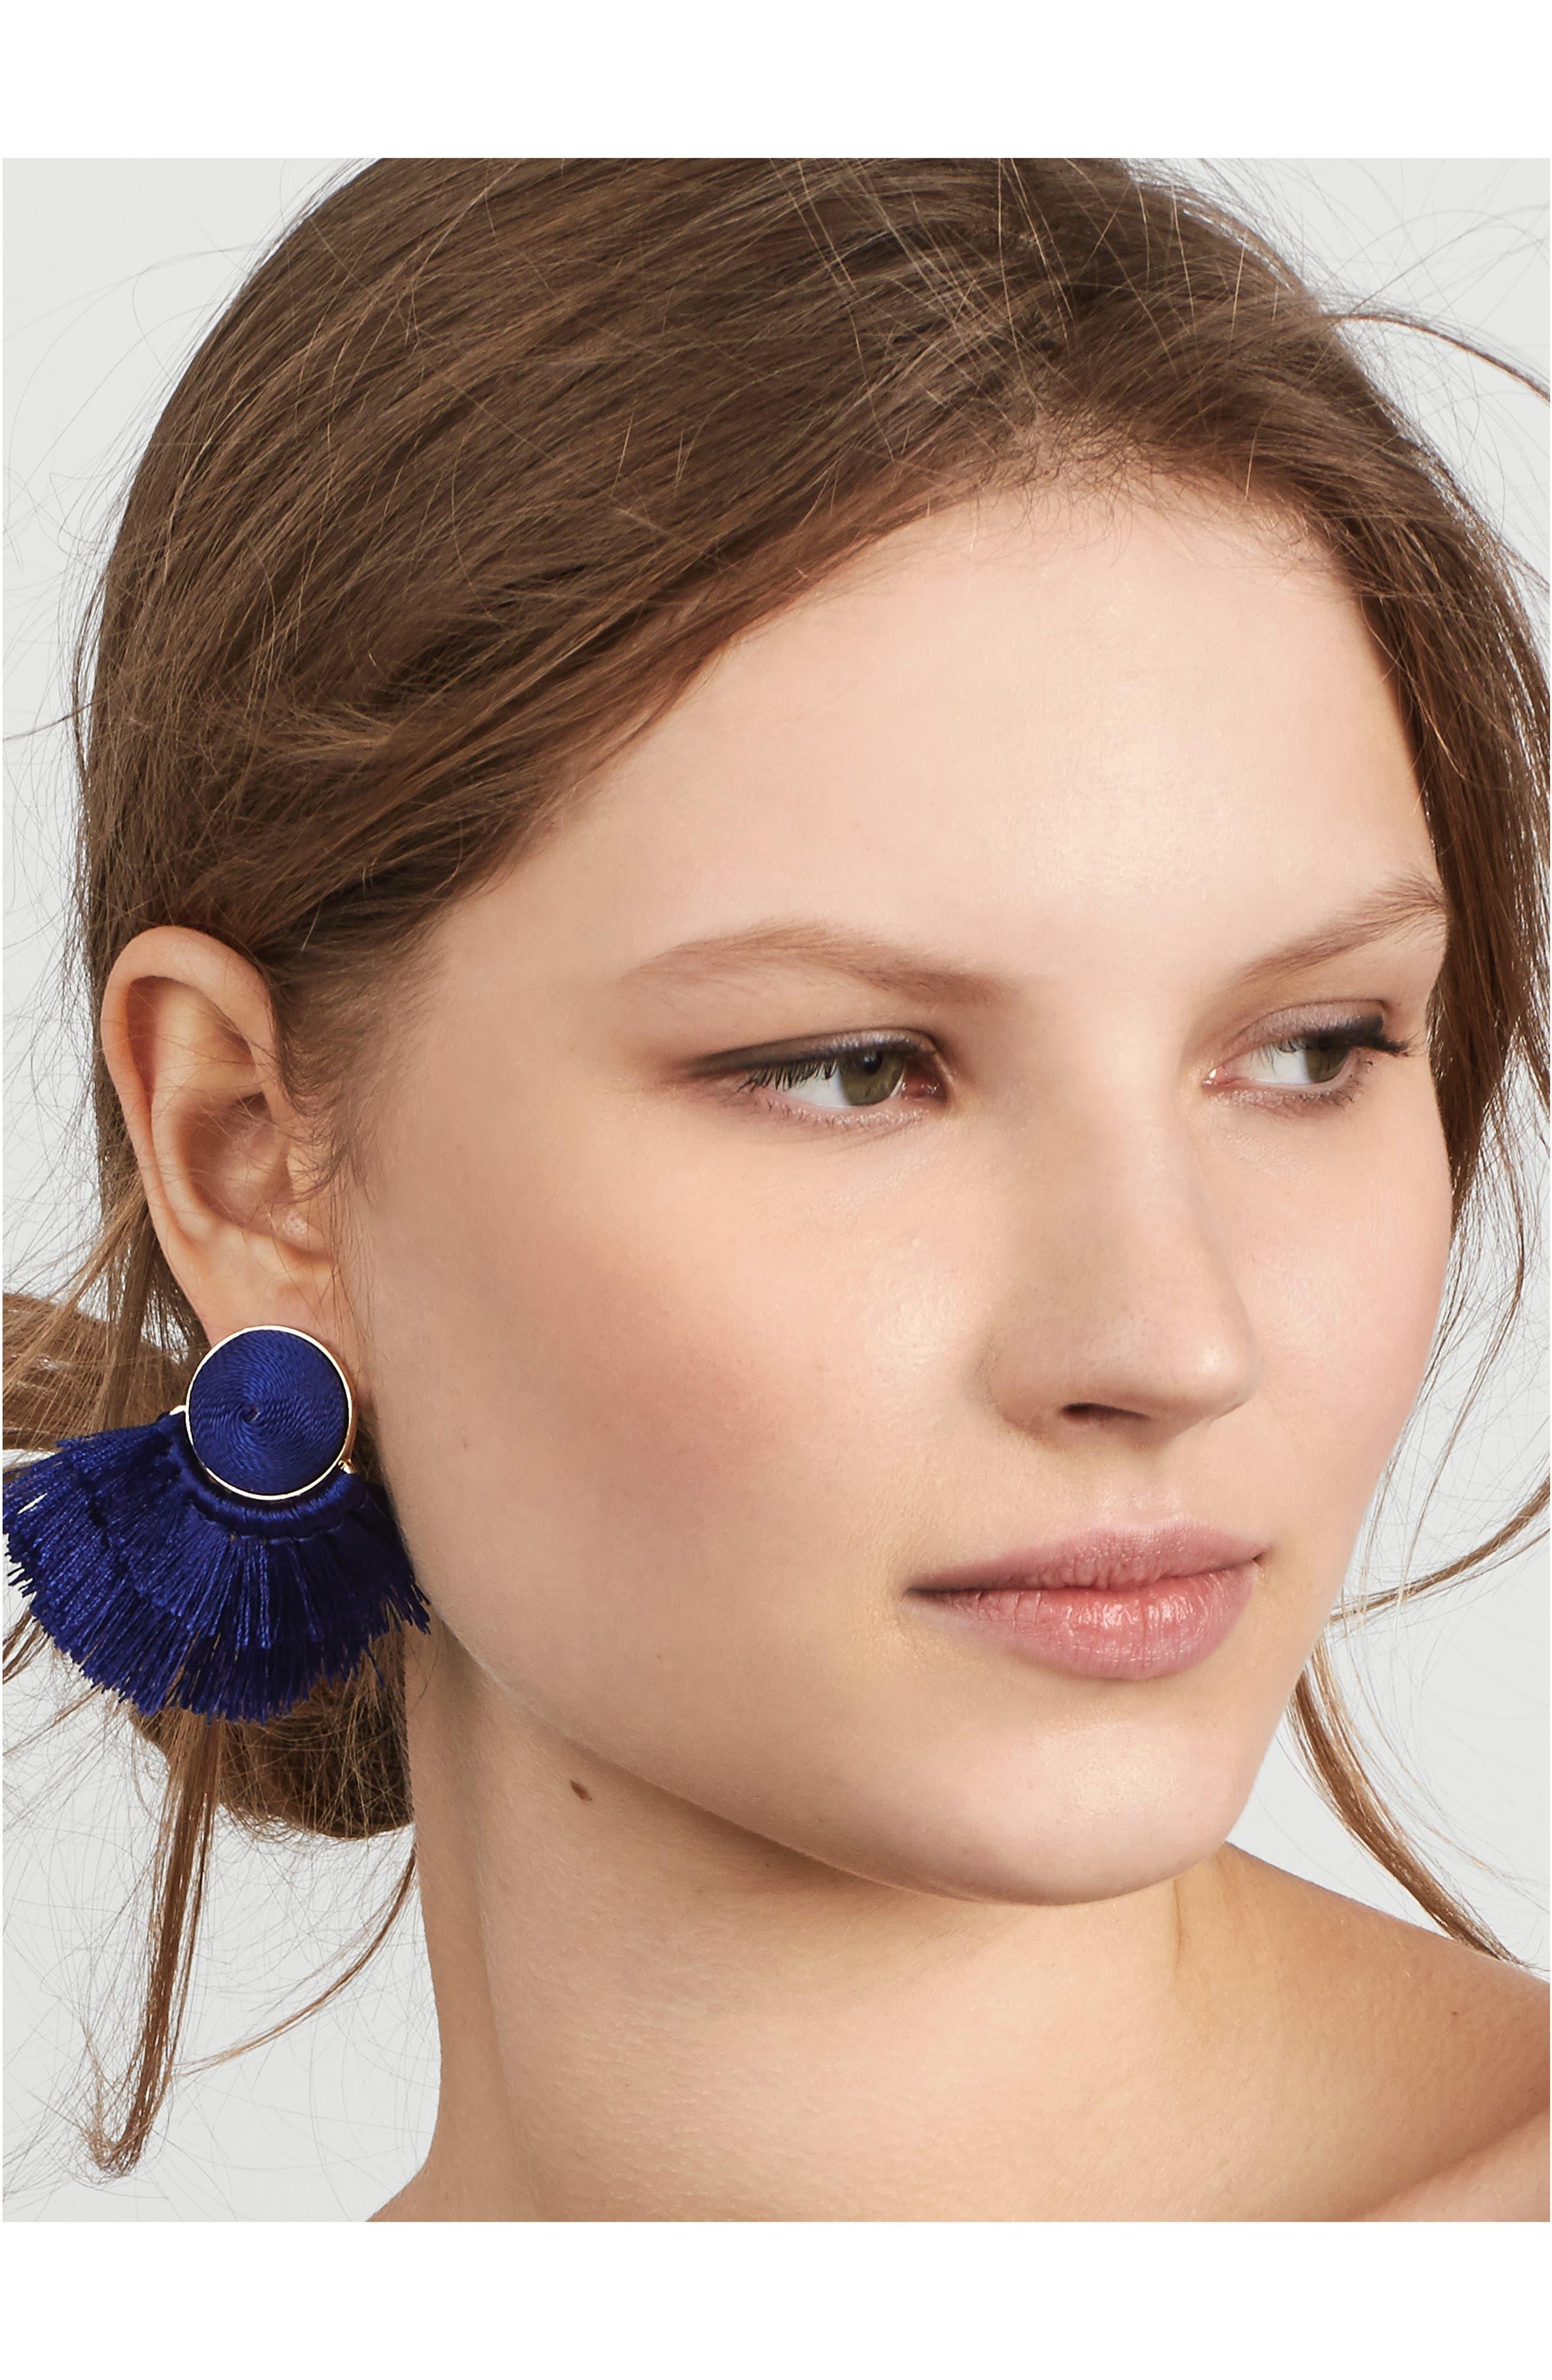 Martina Chubby Deco Fringe Drop Earrings,                             Alternate thumbnail 2, color,                             400